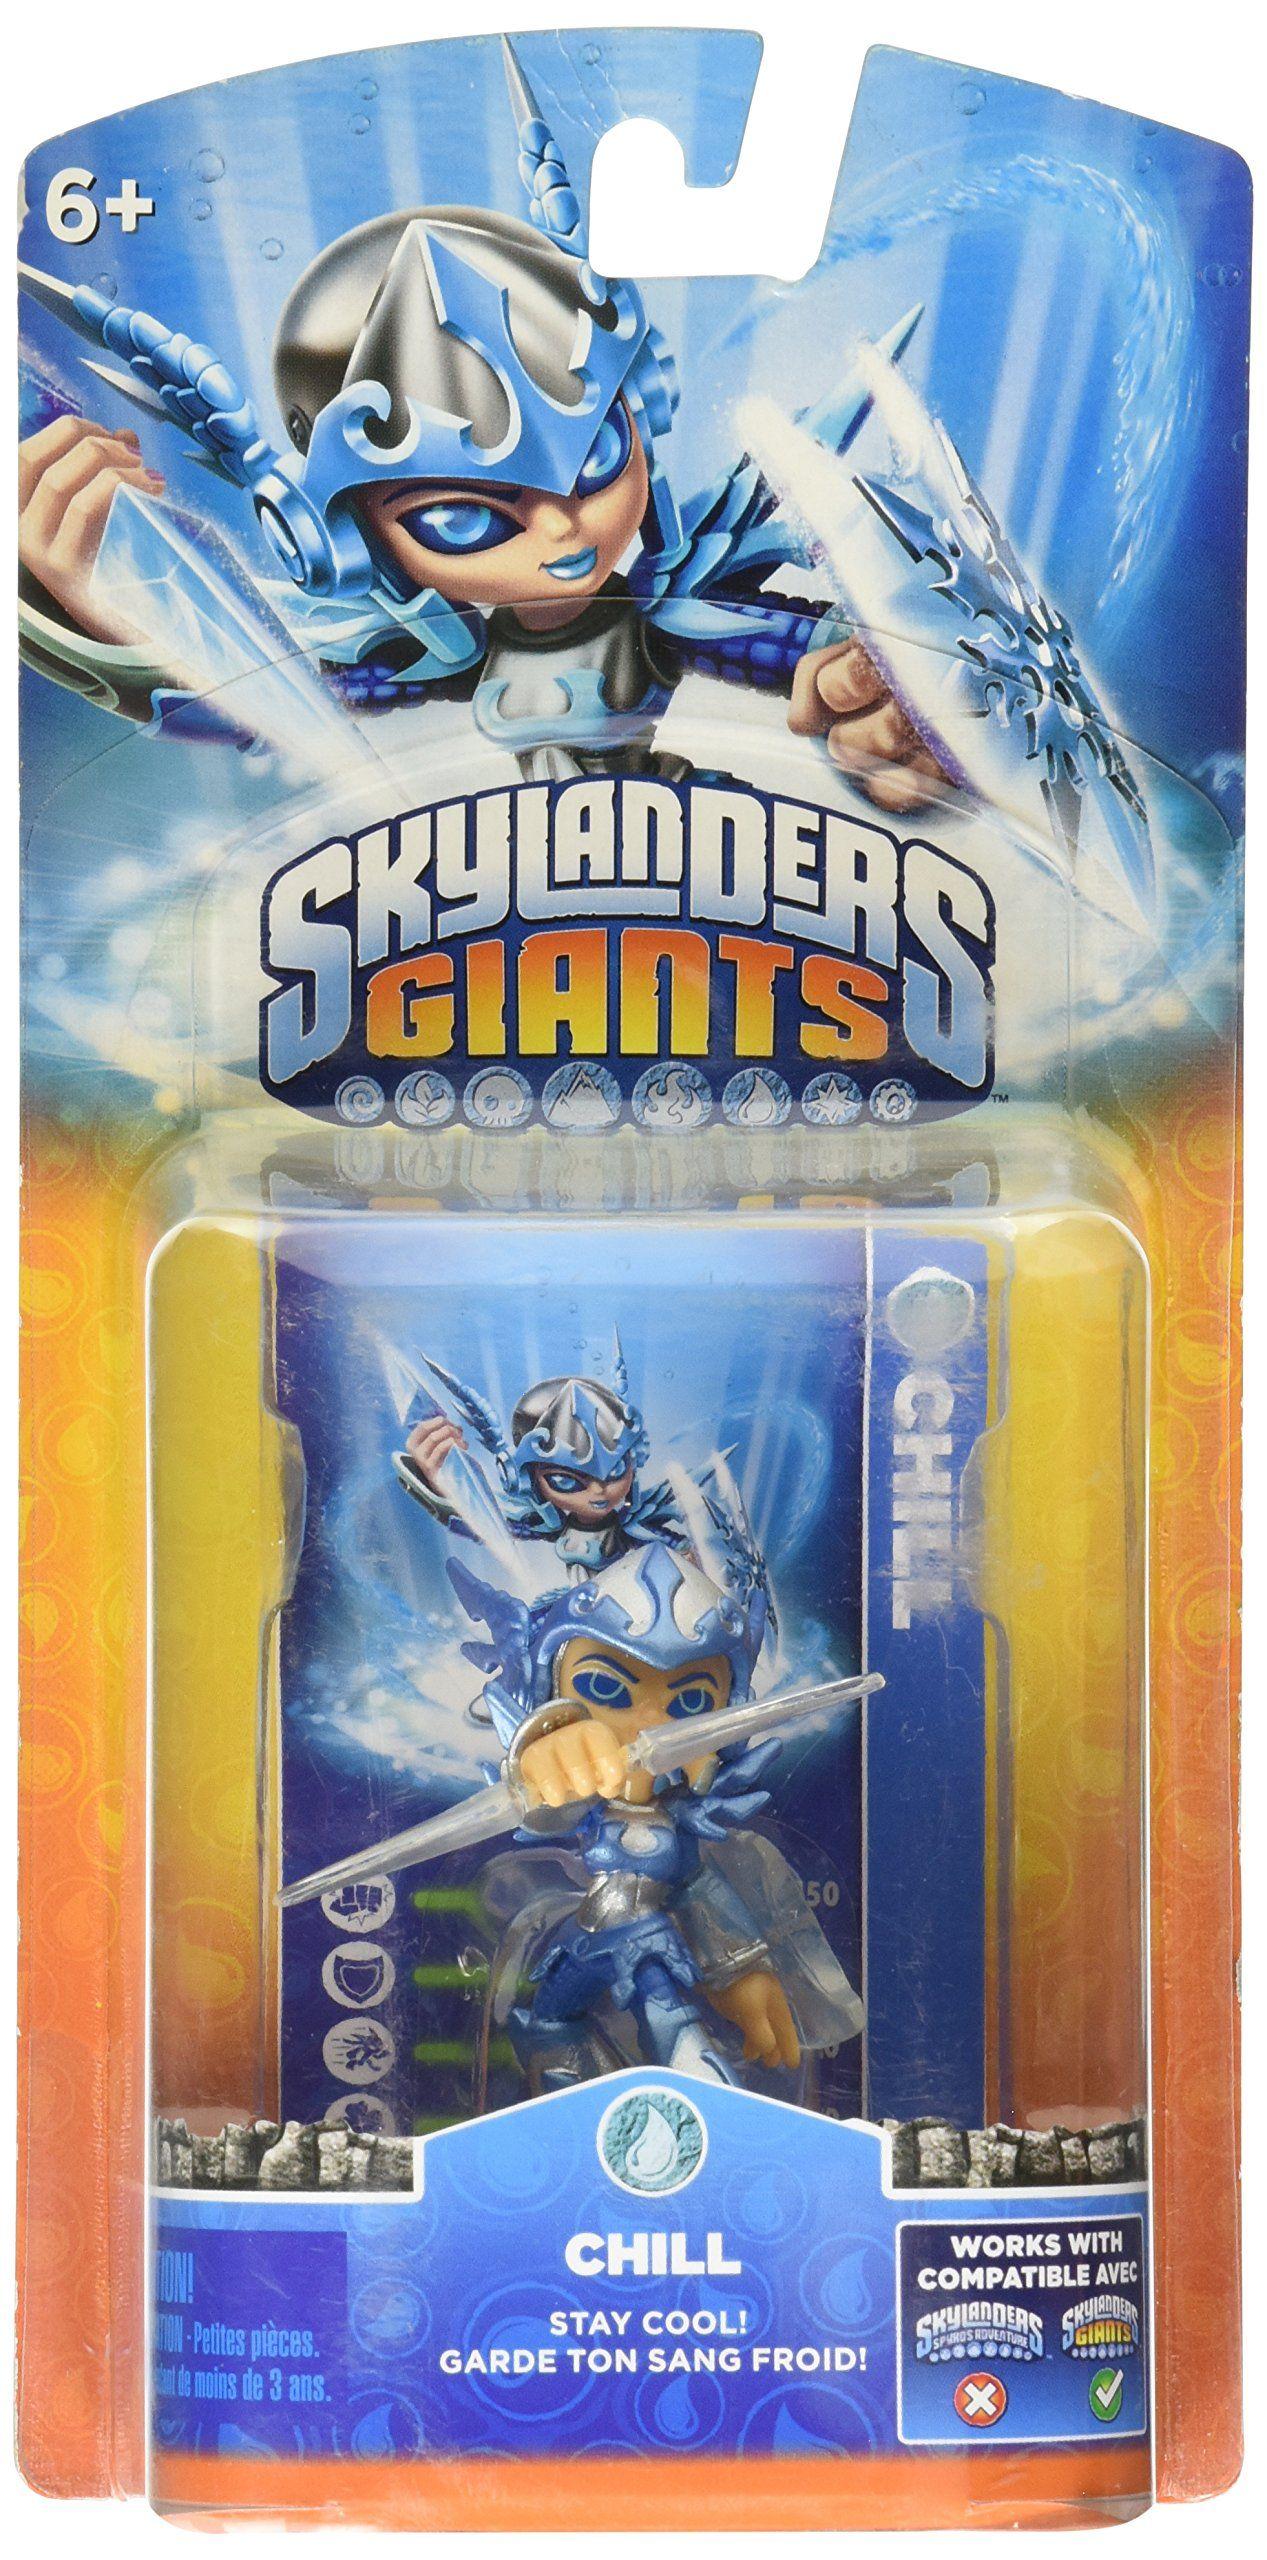 Single Character Skylanders Trap Team Flip Wreck